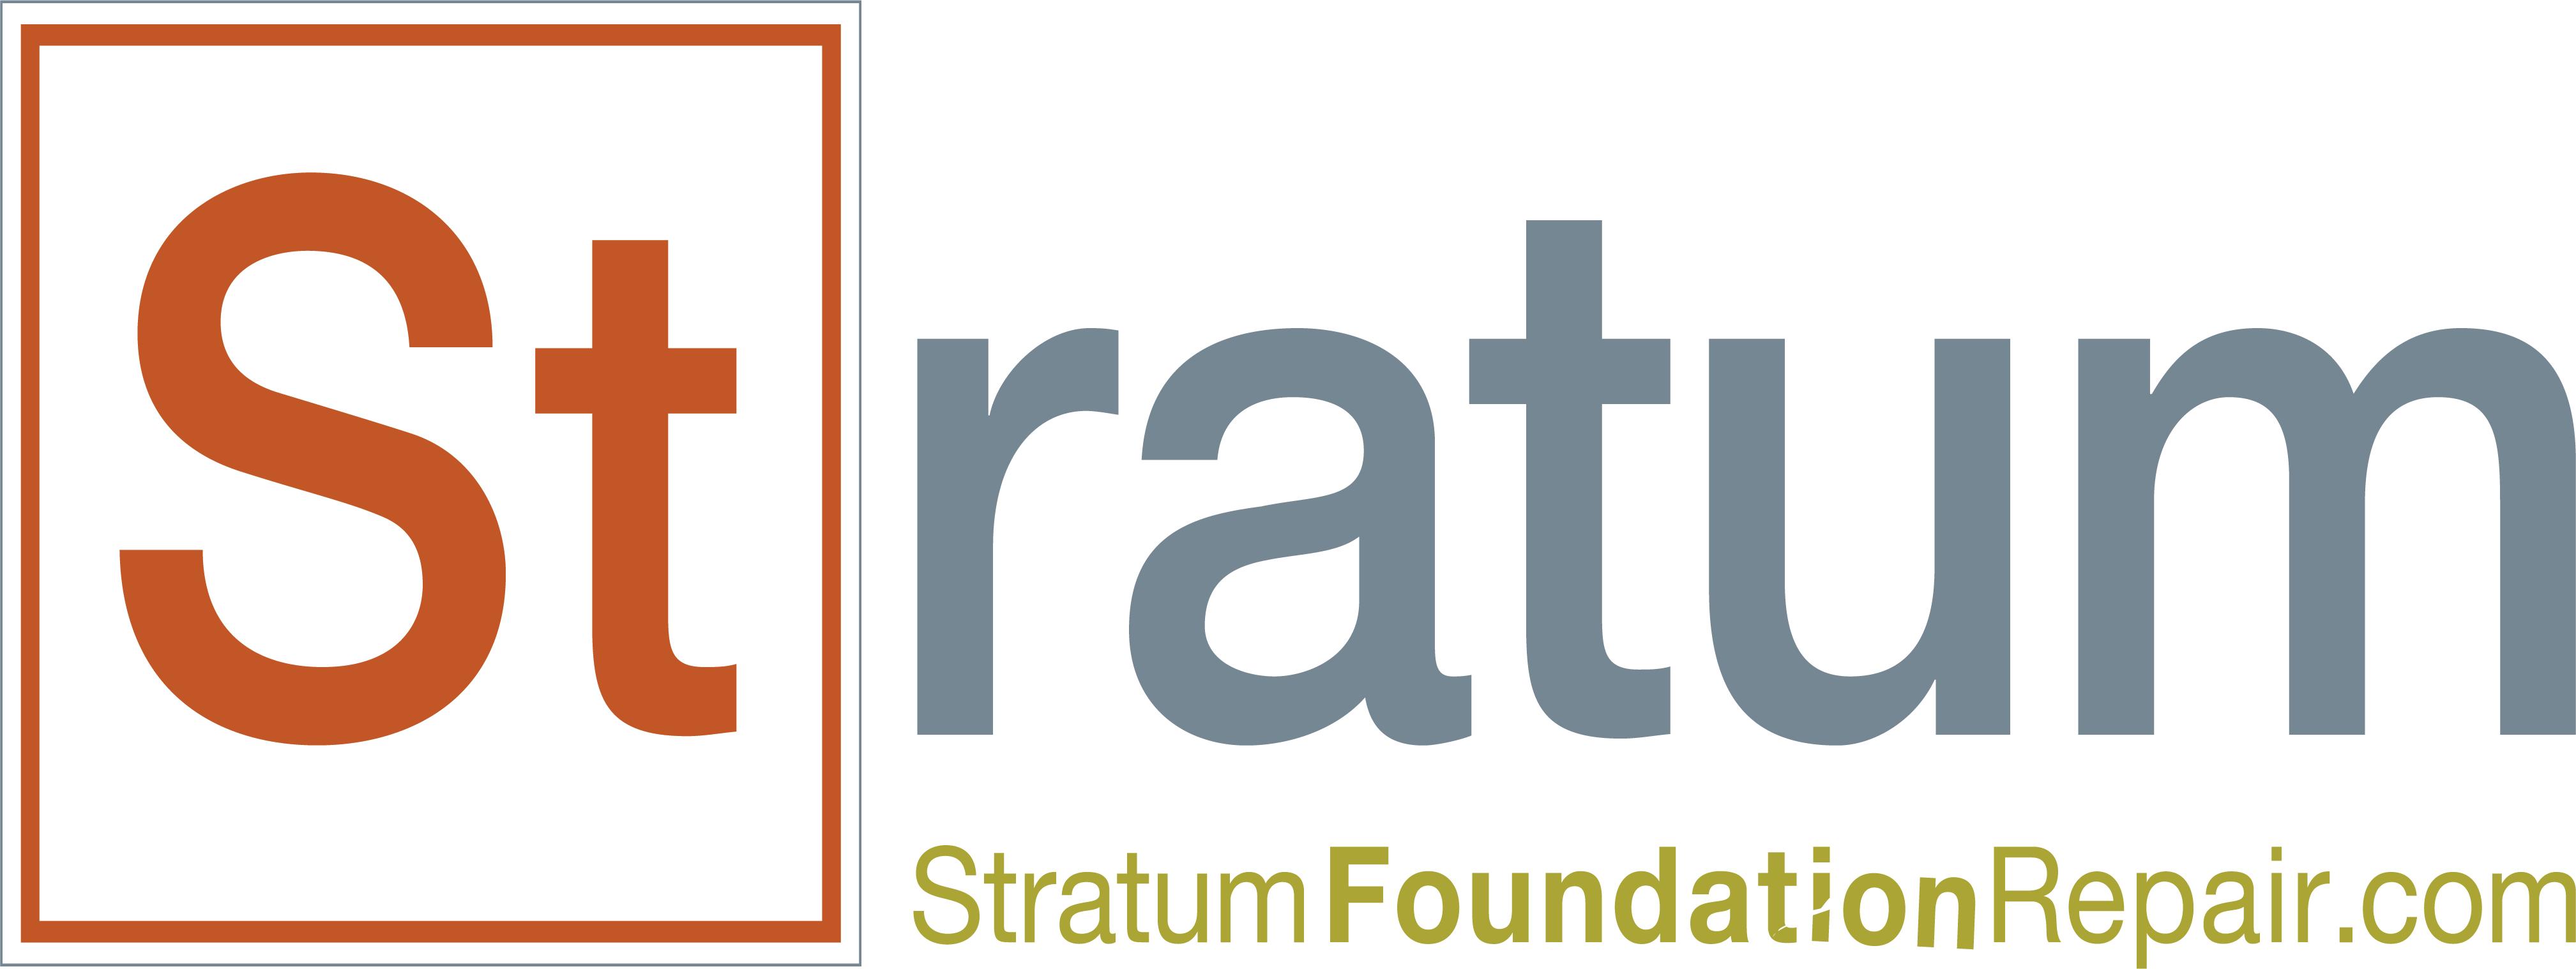 Stratum Foundation Repair reviews | Construction at 1002 Raintree Cir #100 - Allen TX